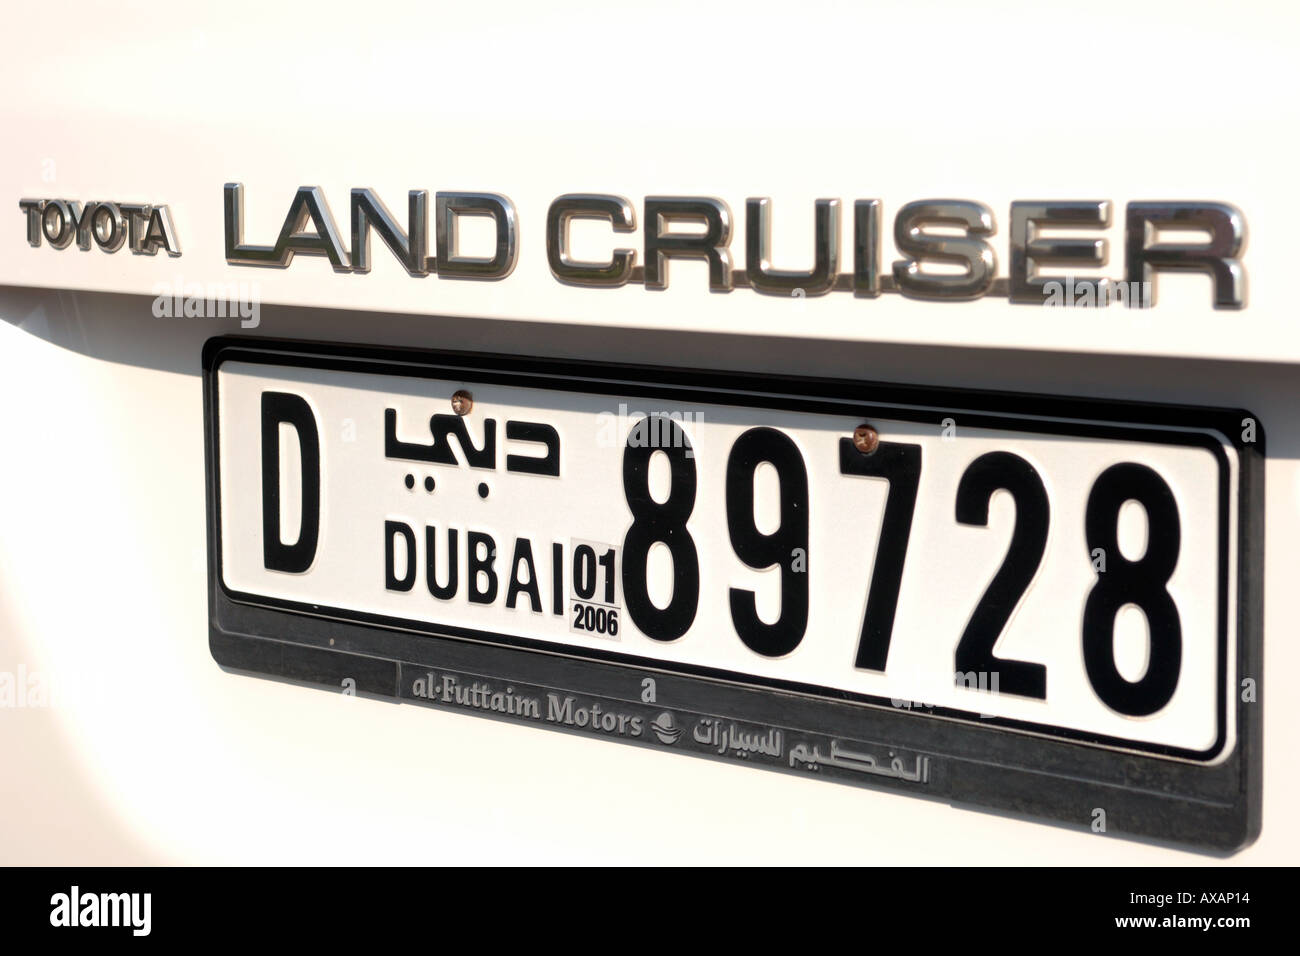 Dubai License Plate Photos Amp Dubai License Plate Images